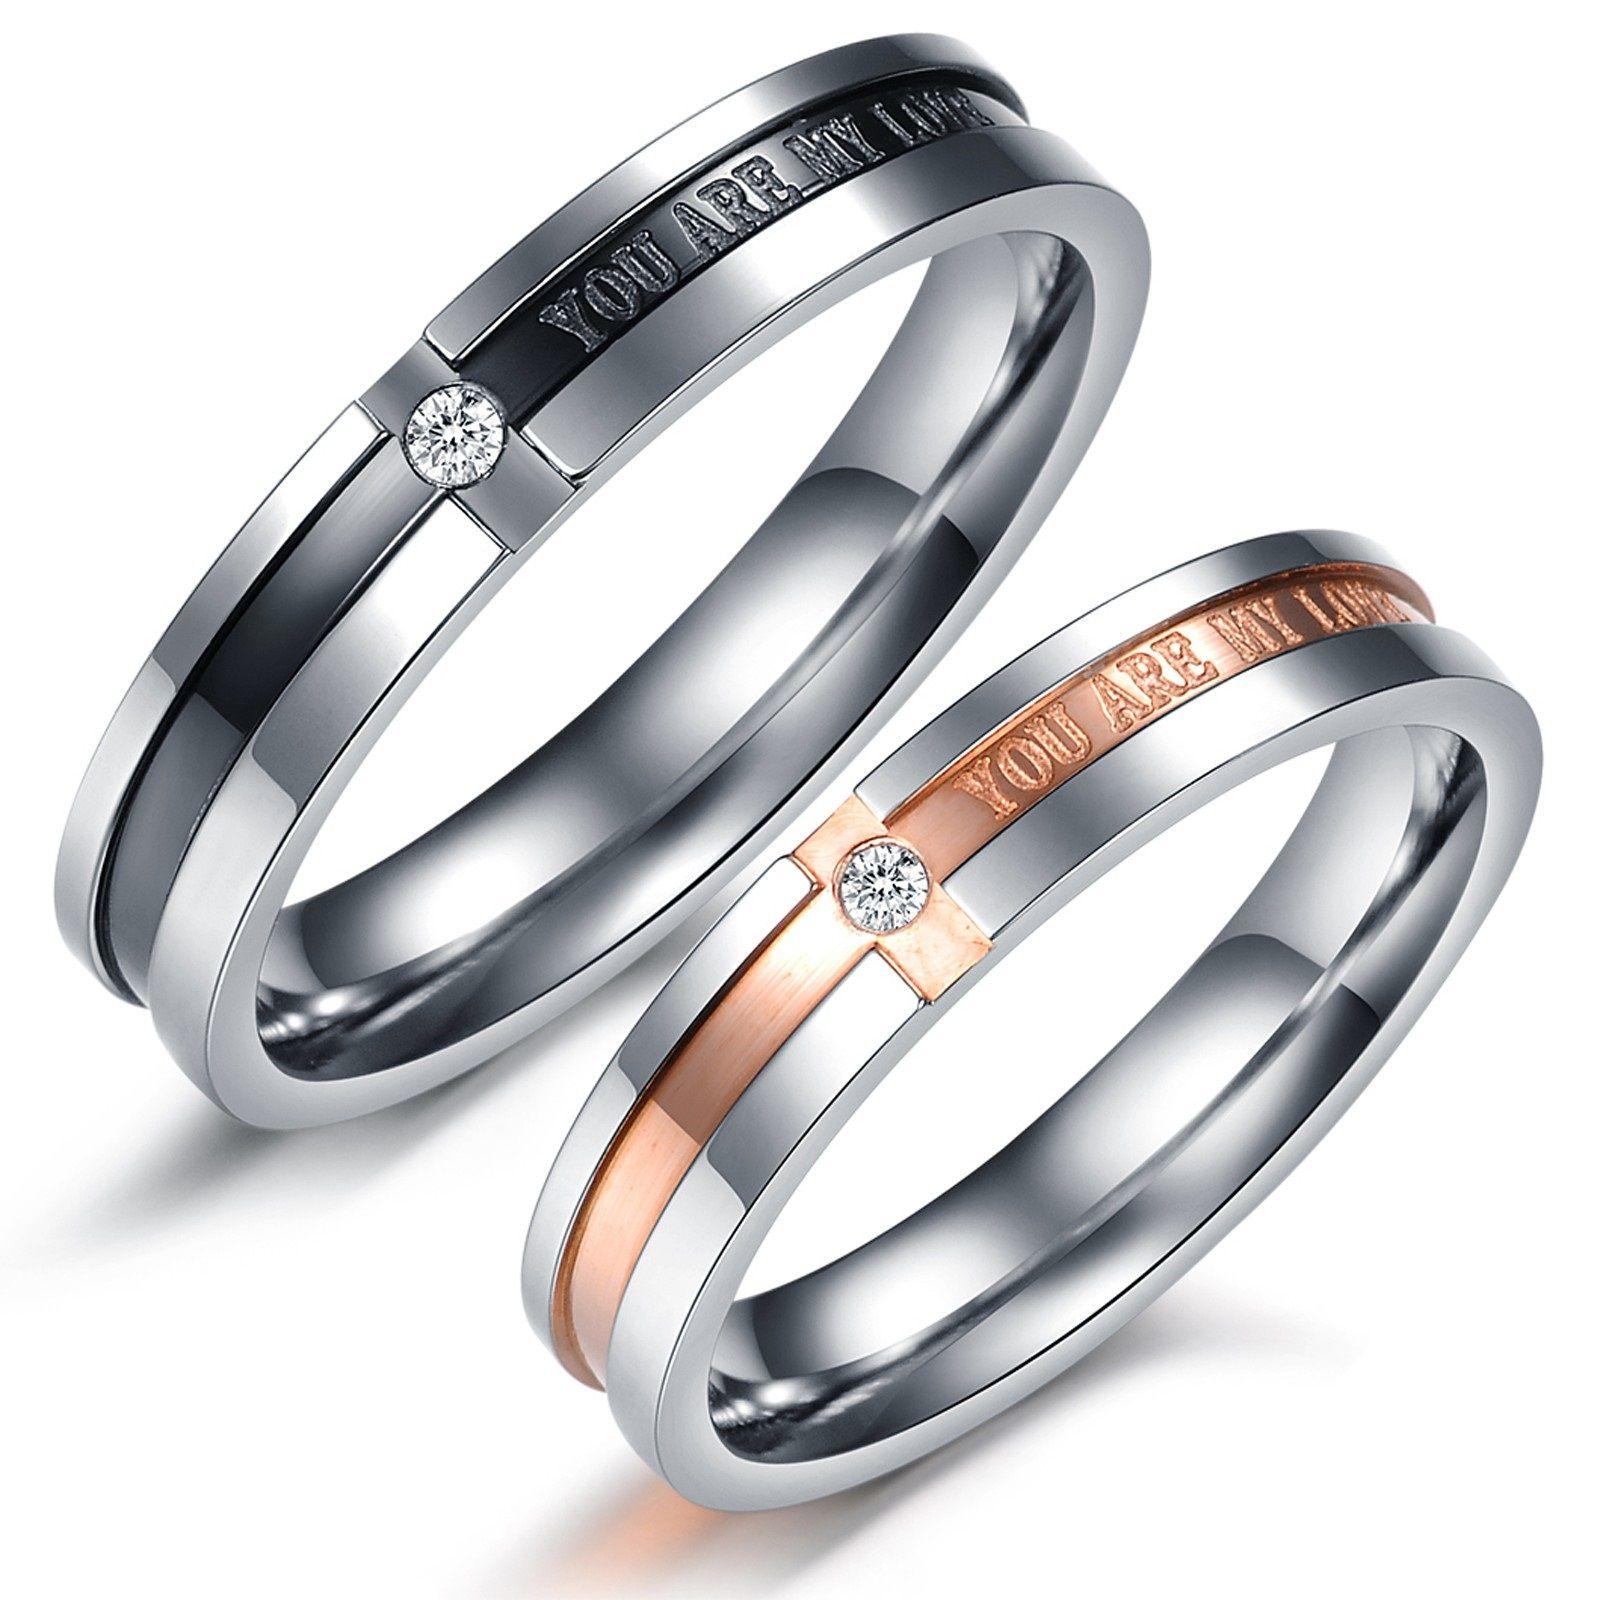 rings wedding Simple bu elegant couples rings Matching Couple Titanium Steel Engagement Promise Ring Wedding Bands